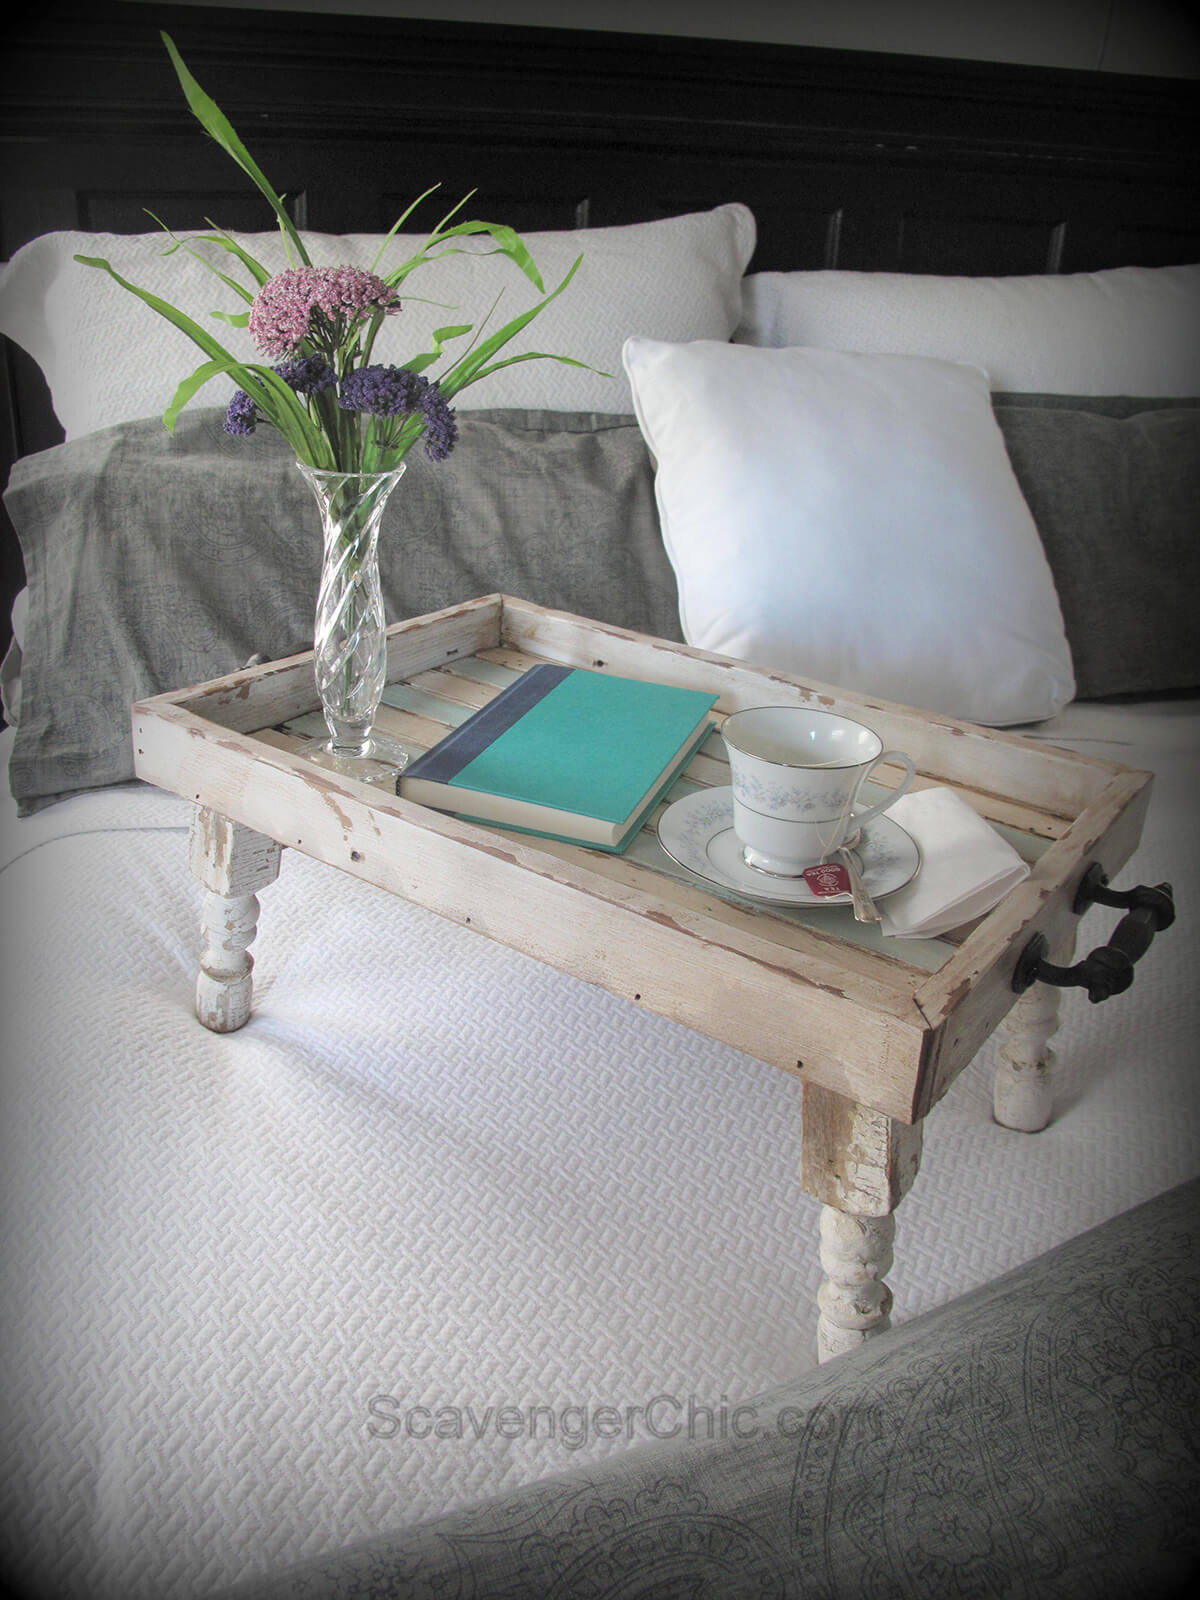 Breakfast in Bed Serving Tray